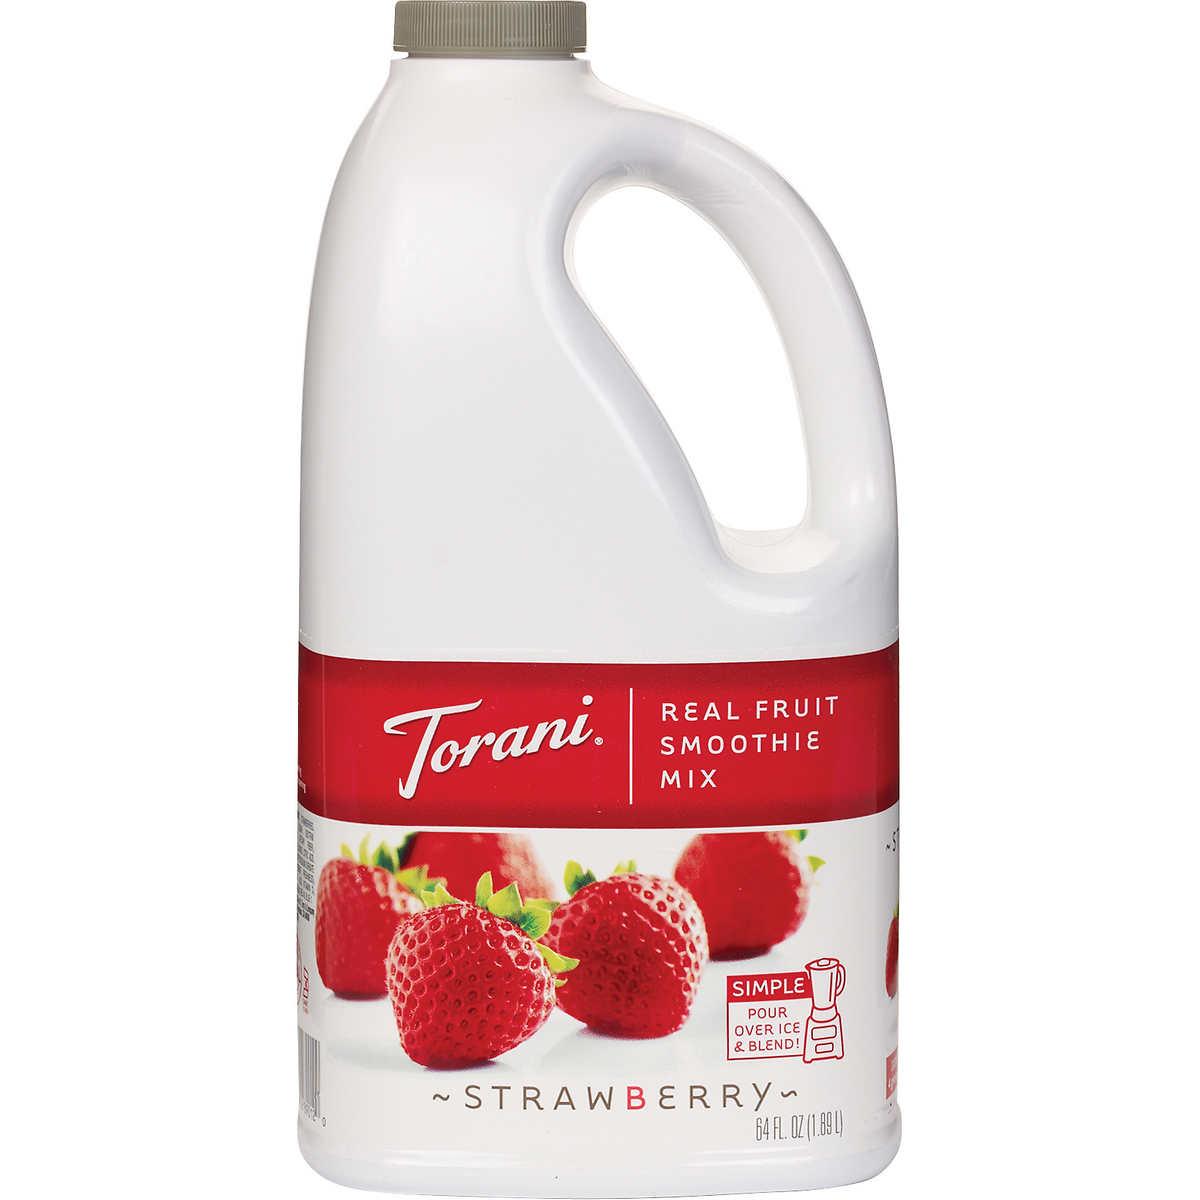 Torani Strawberry Real Fruit Smoothie Mix